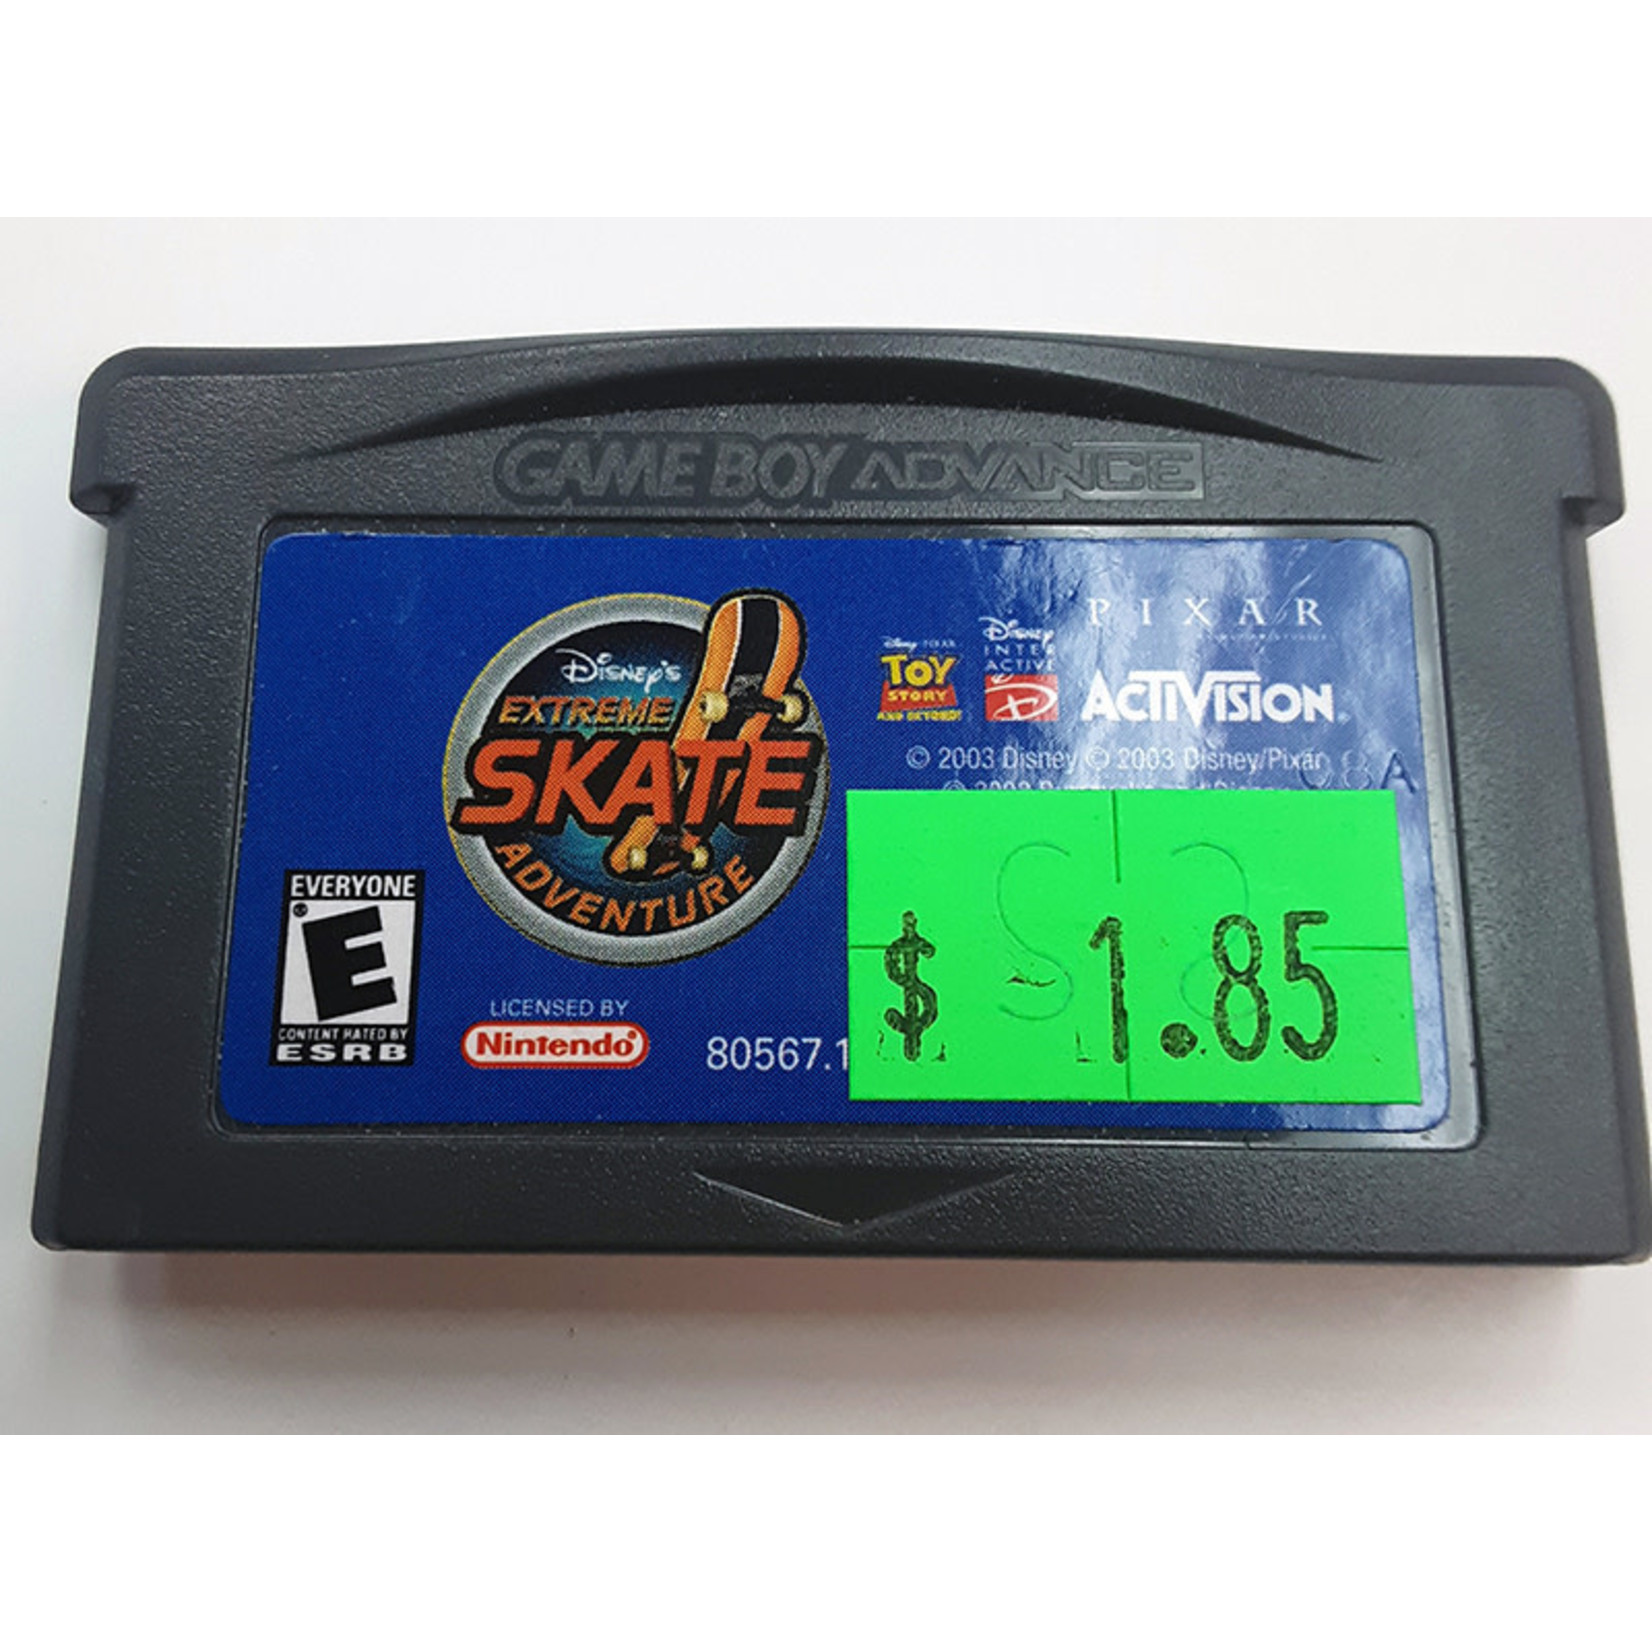 GBAu-Extreme Skate Adventure (cartridge)